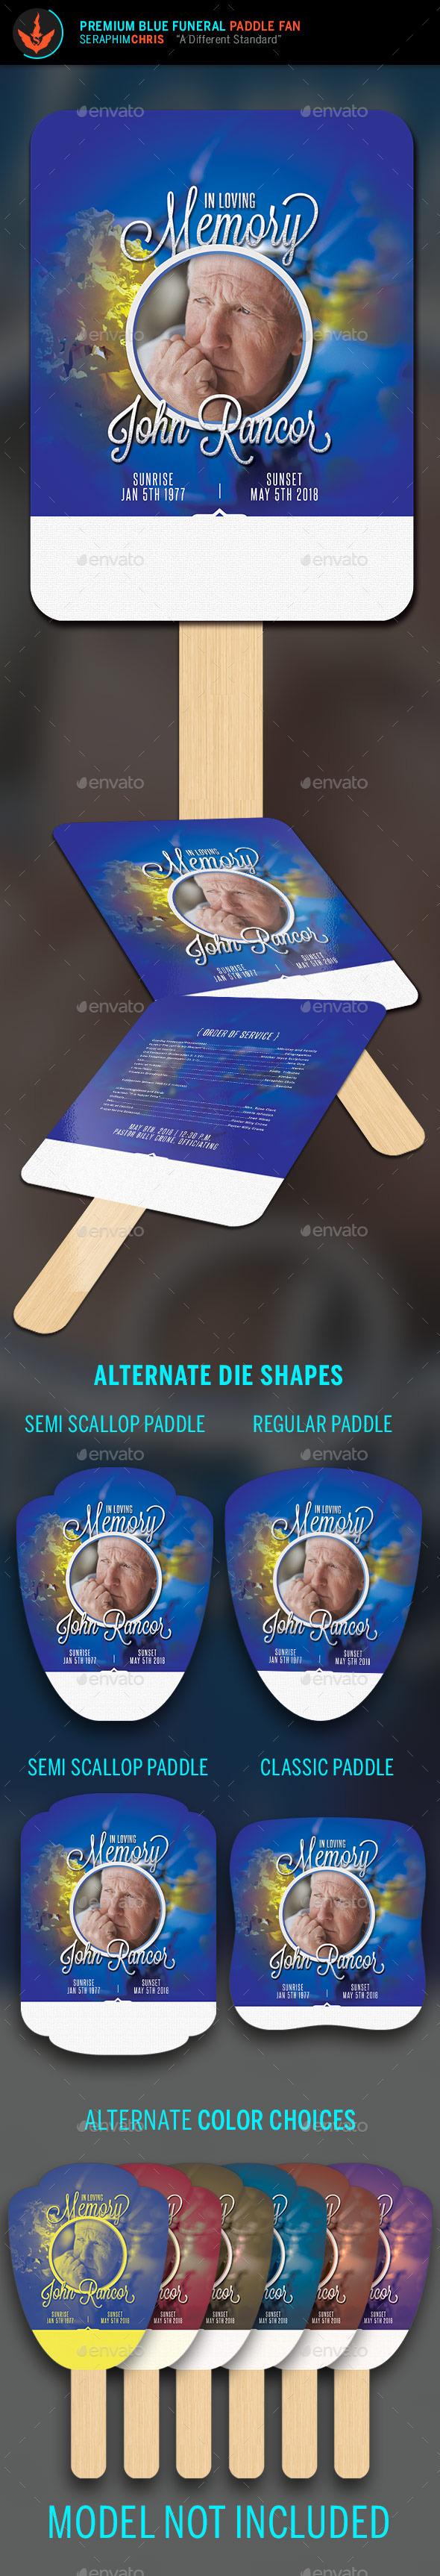 Premium Blue Funeral Paddle Fan Template - Miscellaneous Print Templates